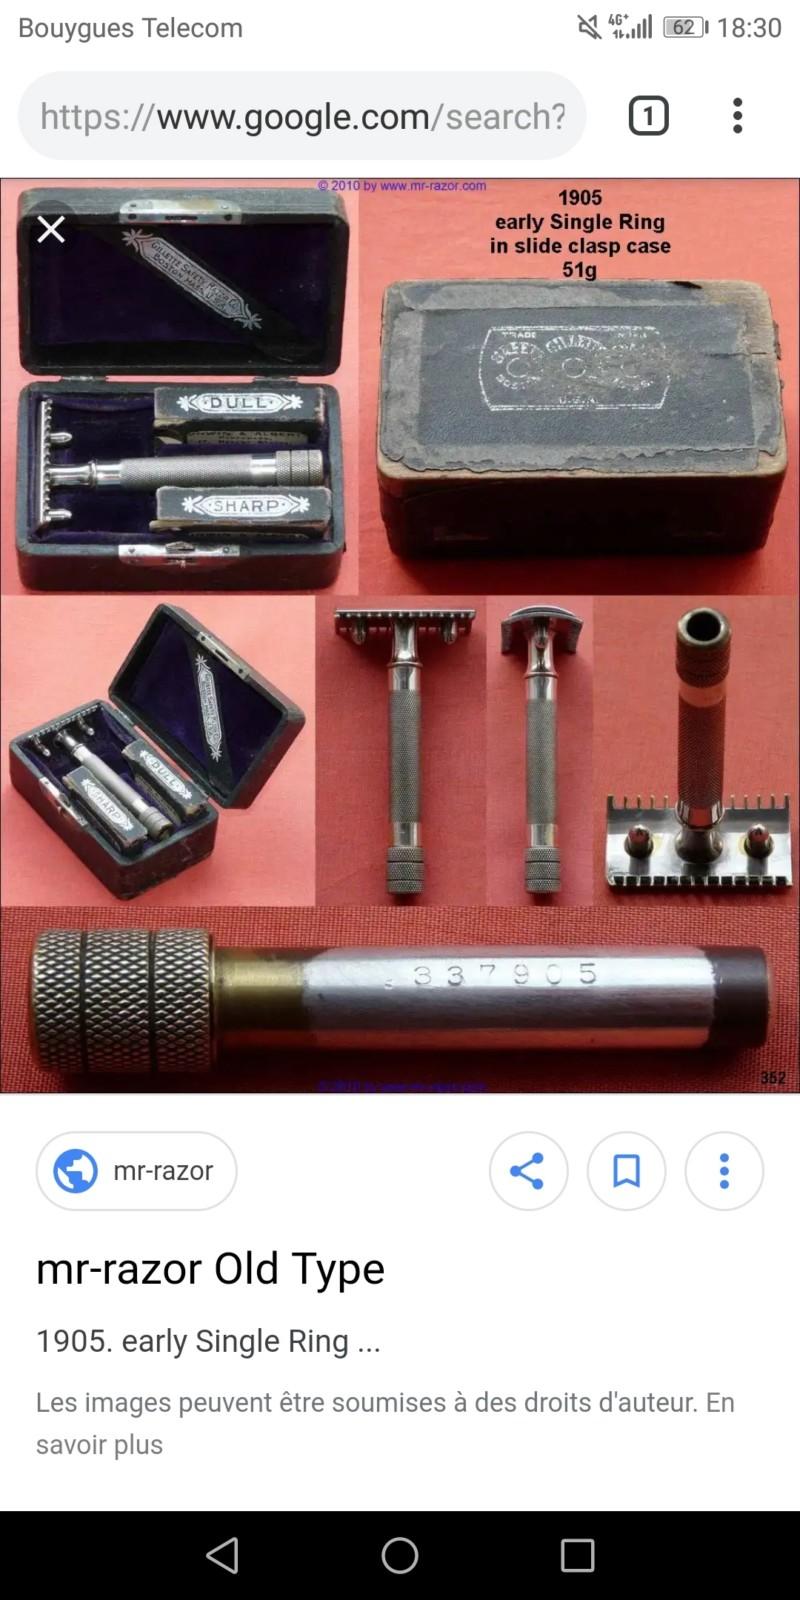 Rasoir gillette old type 20190210